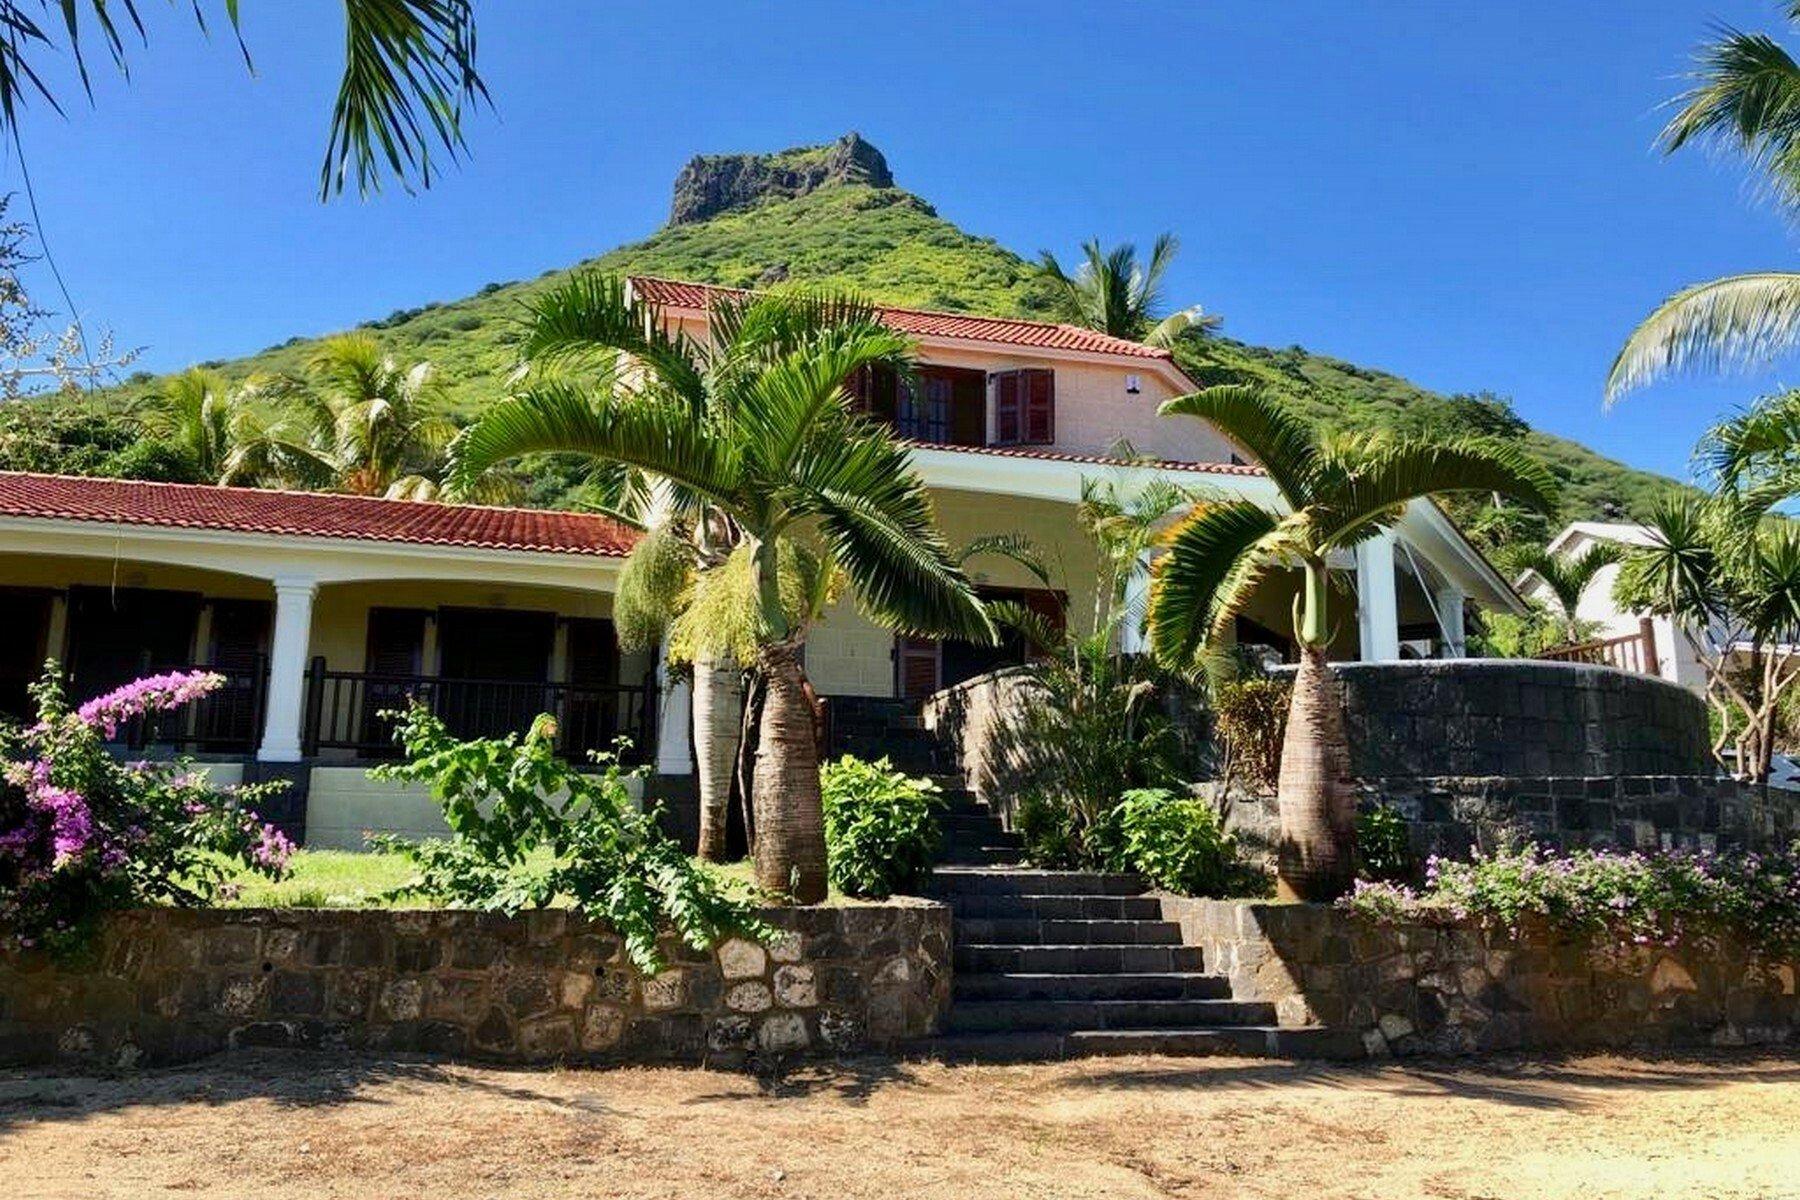 House in Tamarin, Rivière Noire District, Mauritius 1